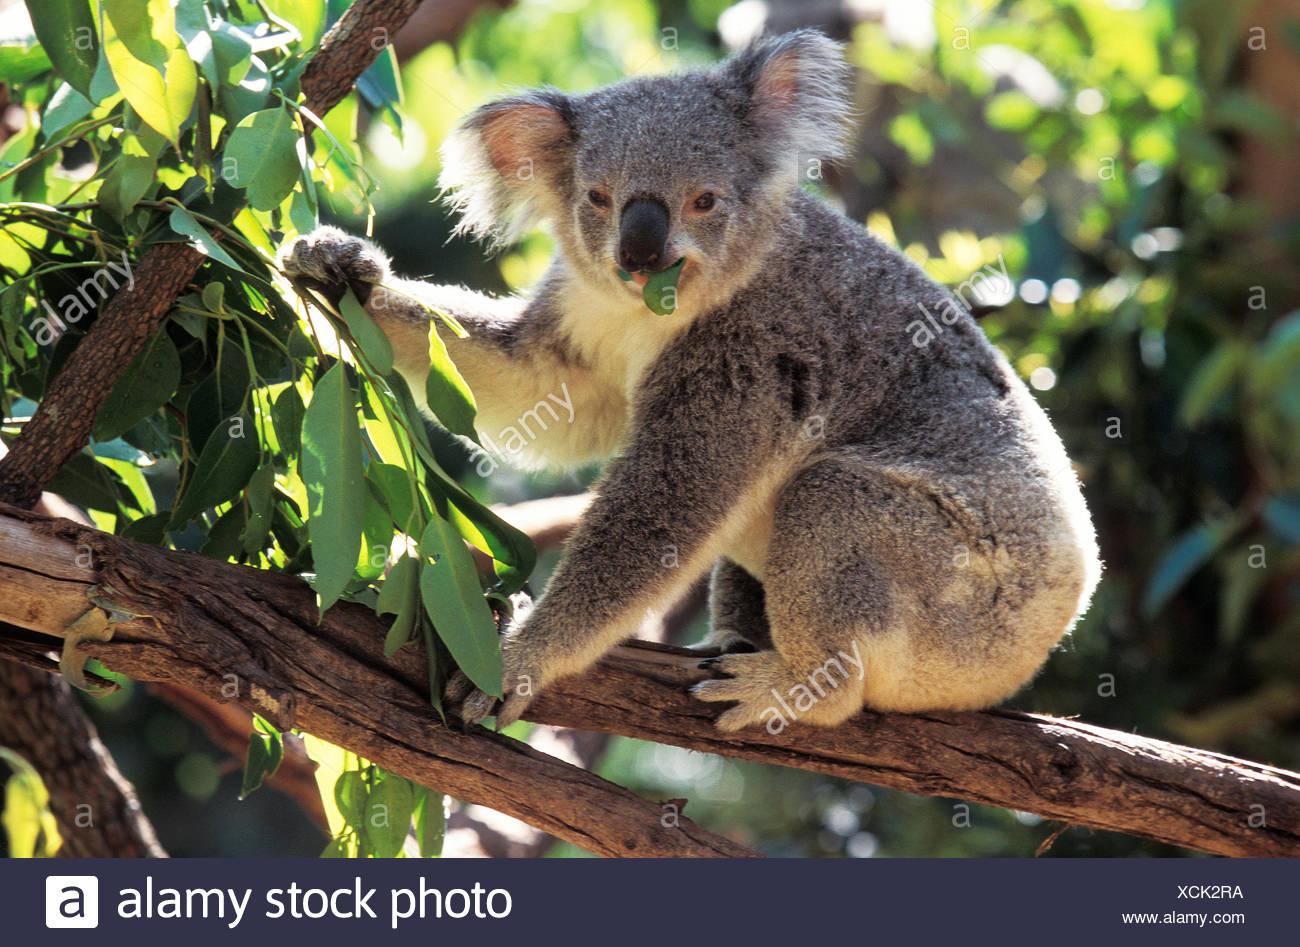 KOALA phascolarctos cinereus, ADULT EATING EUCALYPTUS LEAF, AUSTRALIA - Stock Image